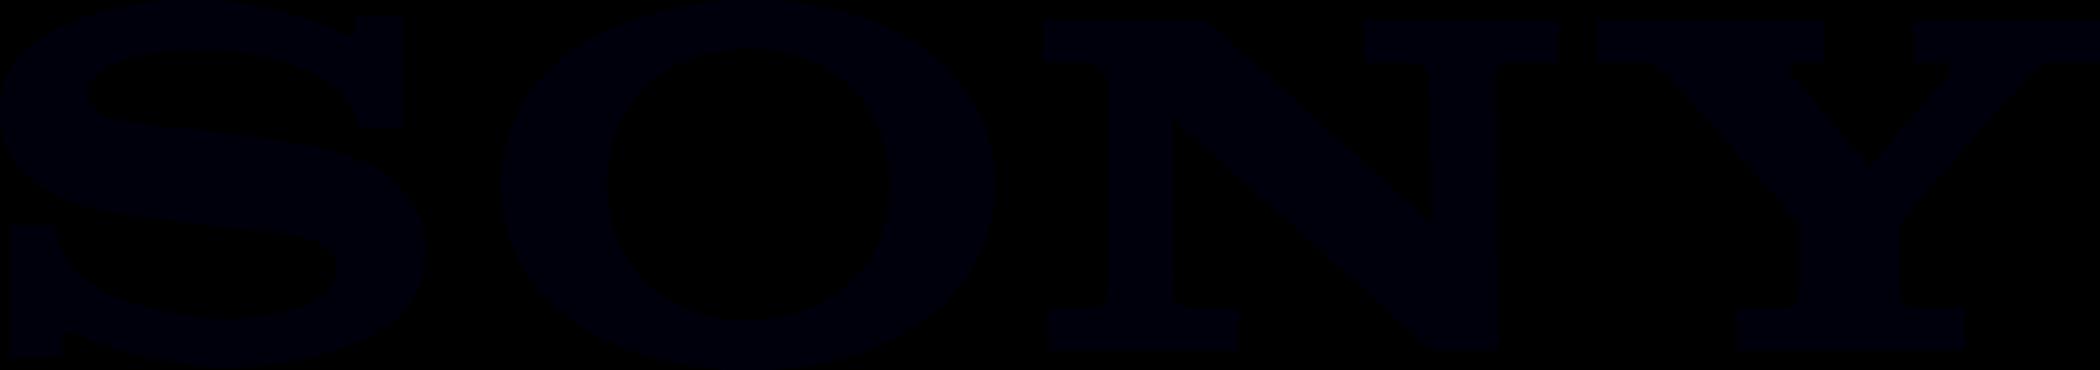 sony logo 1 1 - Sony Logo